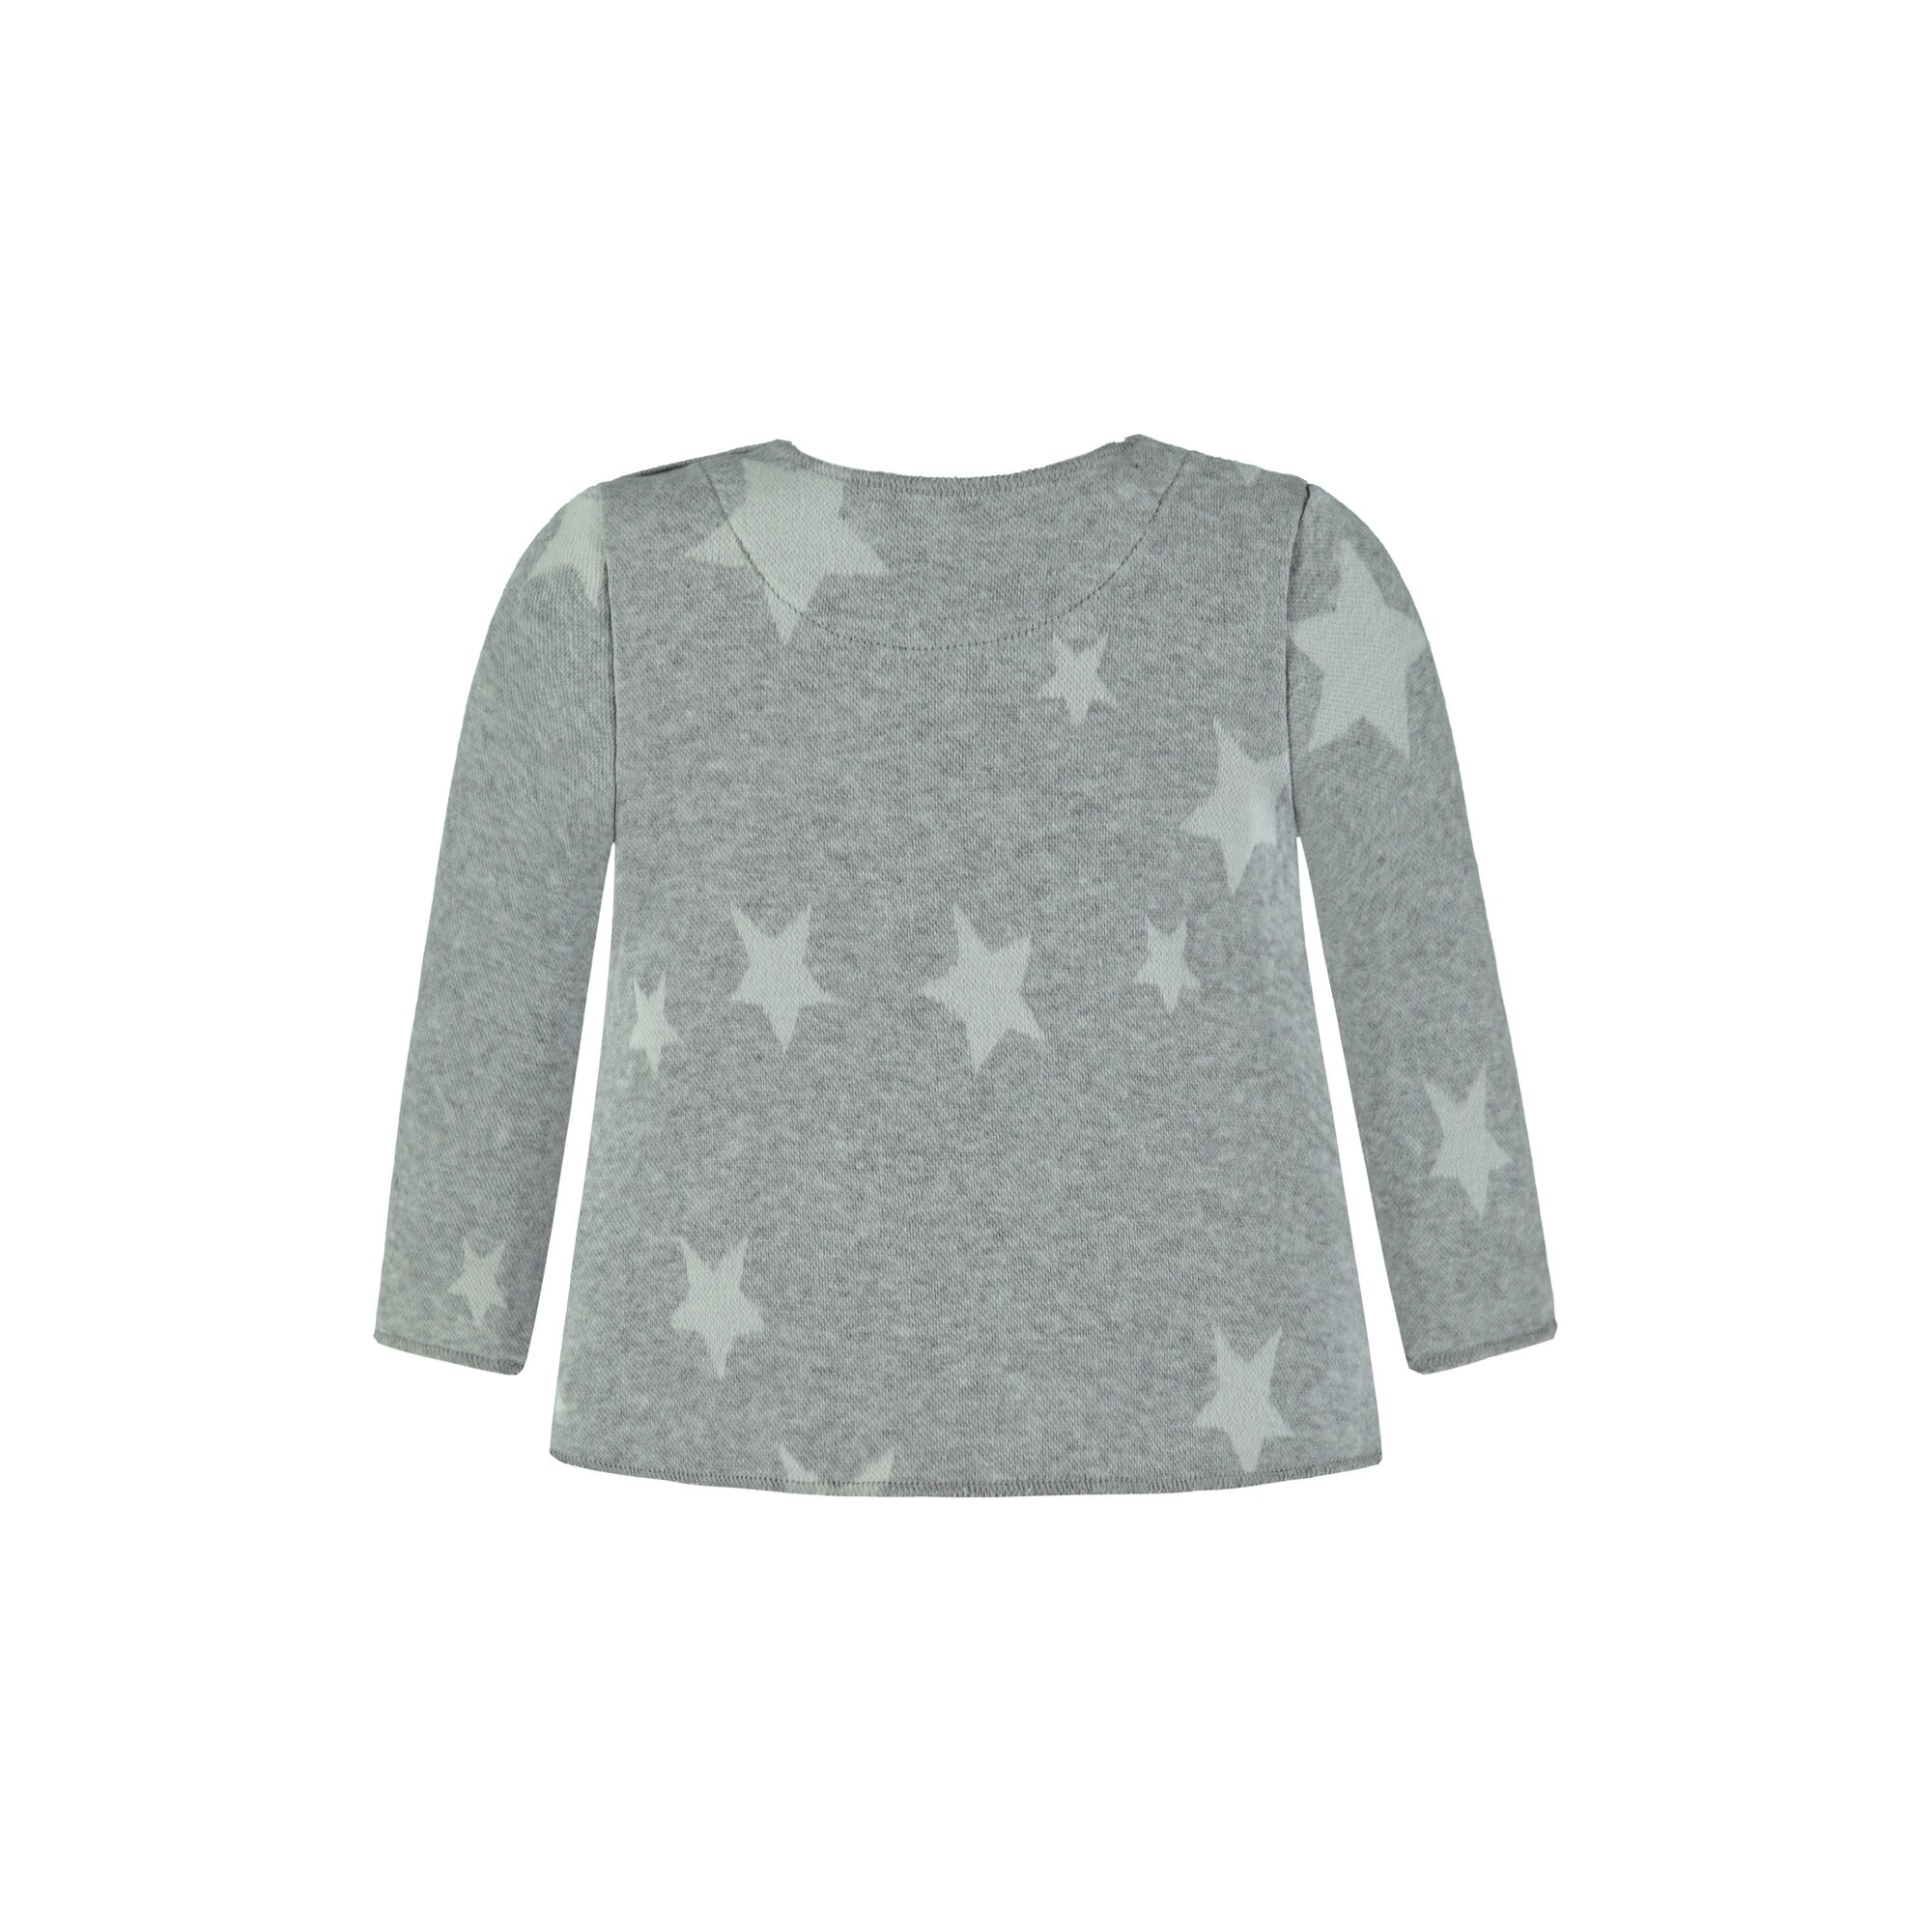 bellybutton-langarmshirt, 14.95 EUR @ babywalz-de